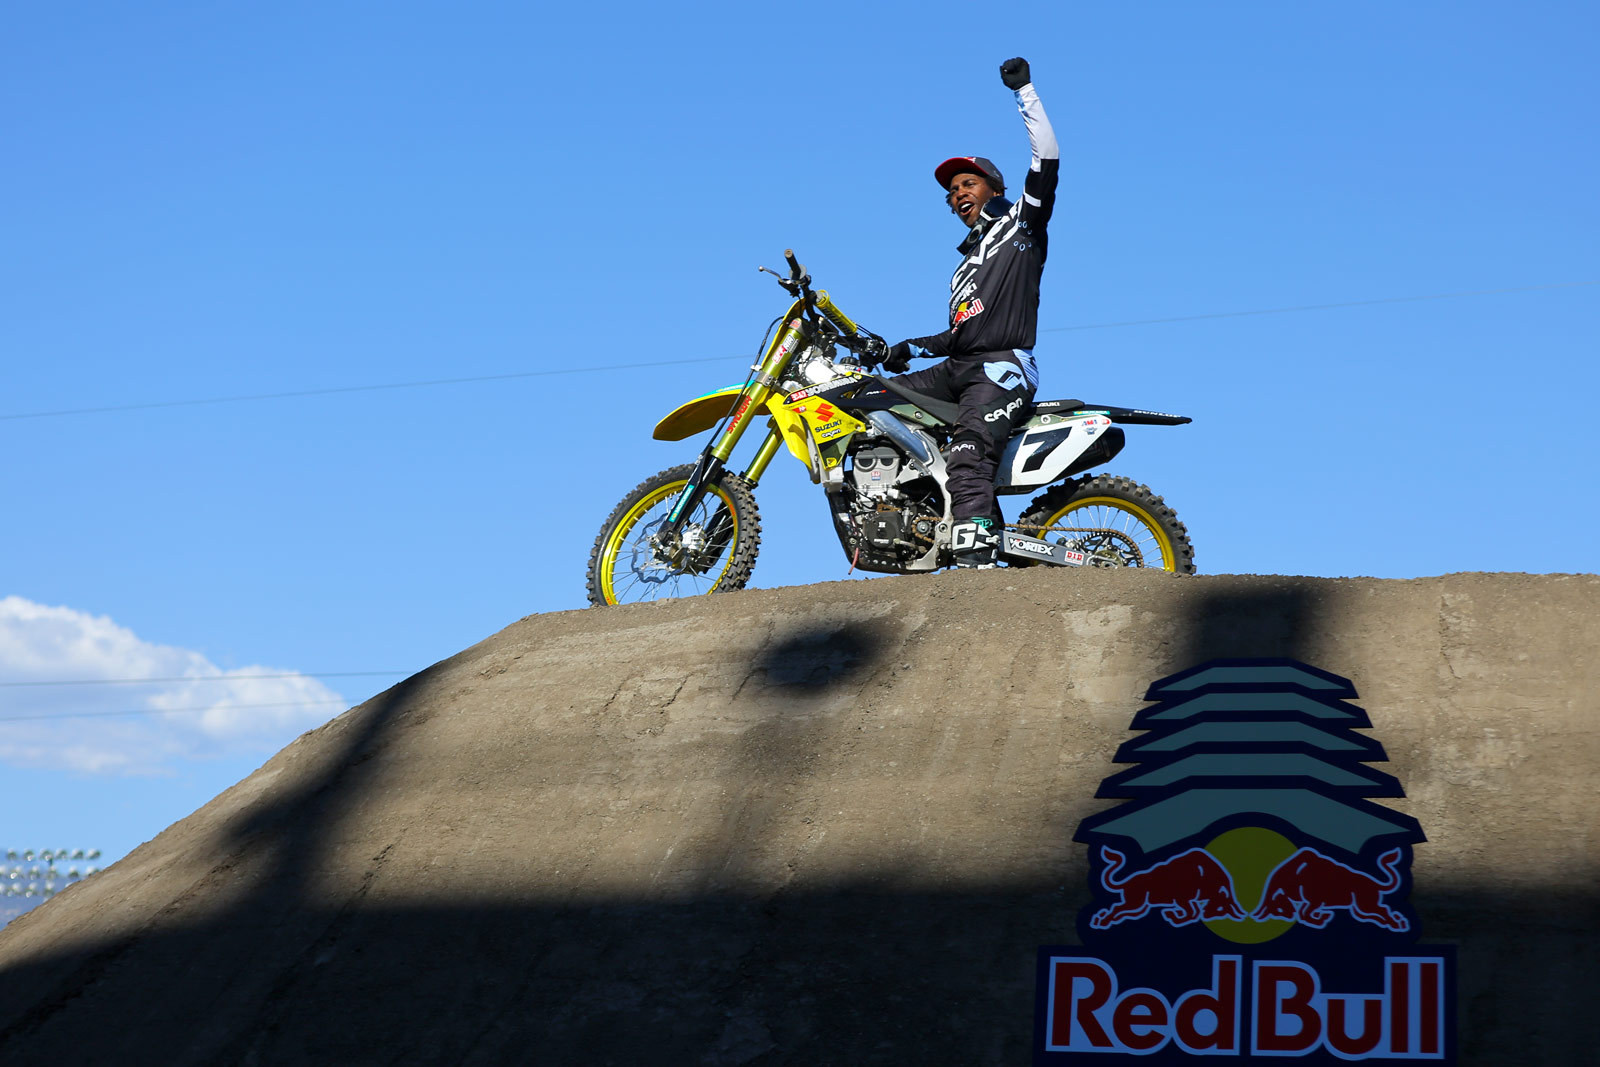 James Stewart - Photo Blast: Red Bull Straight Rhythm - Motocross Pictures - Vital MX